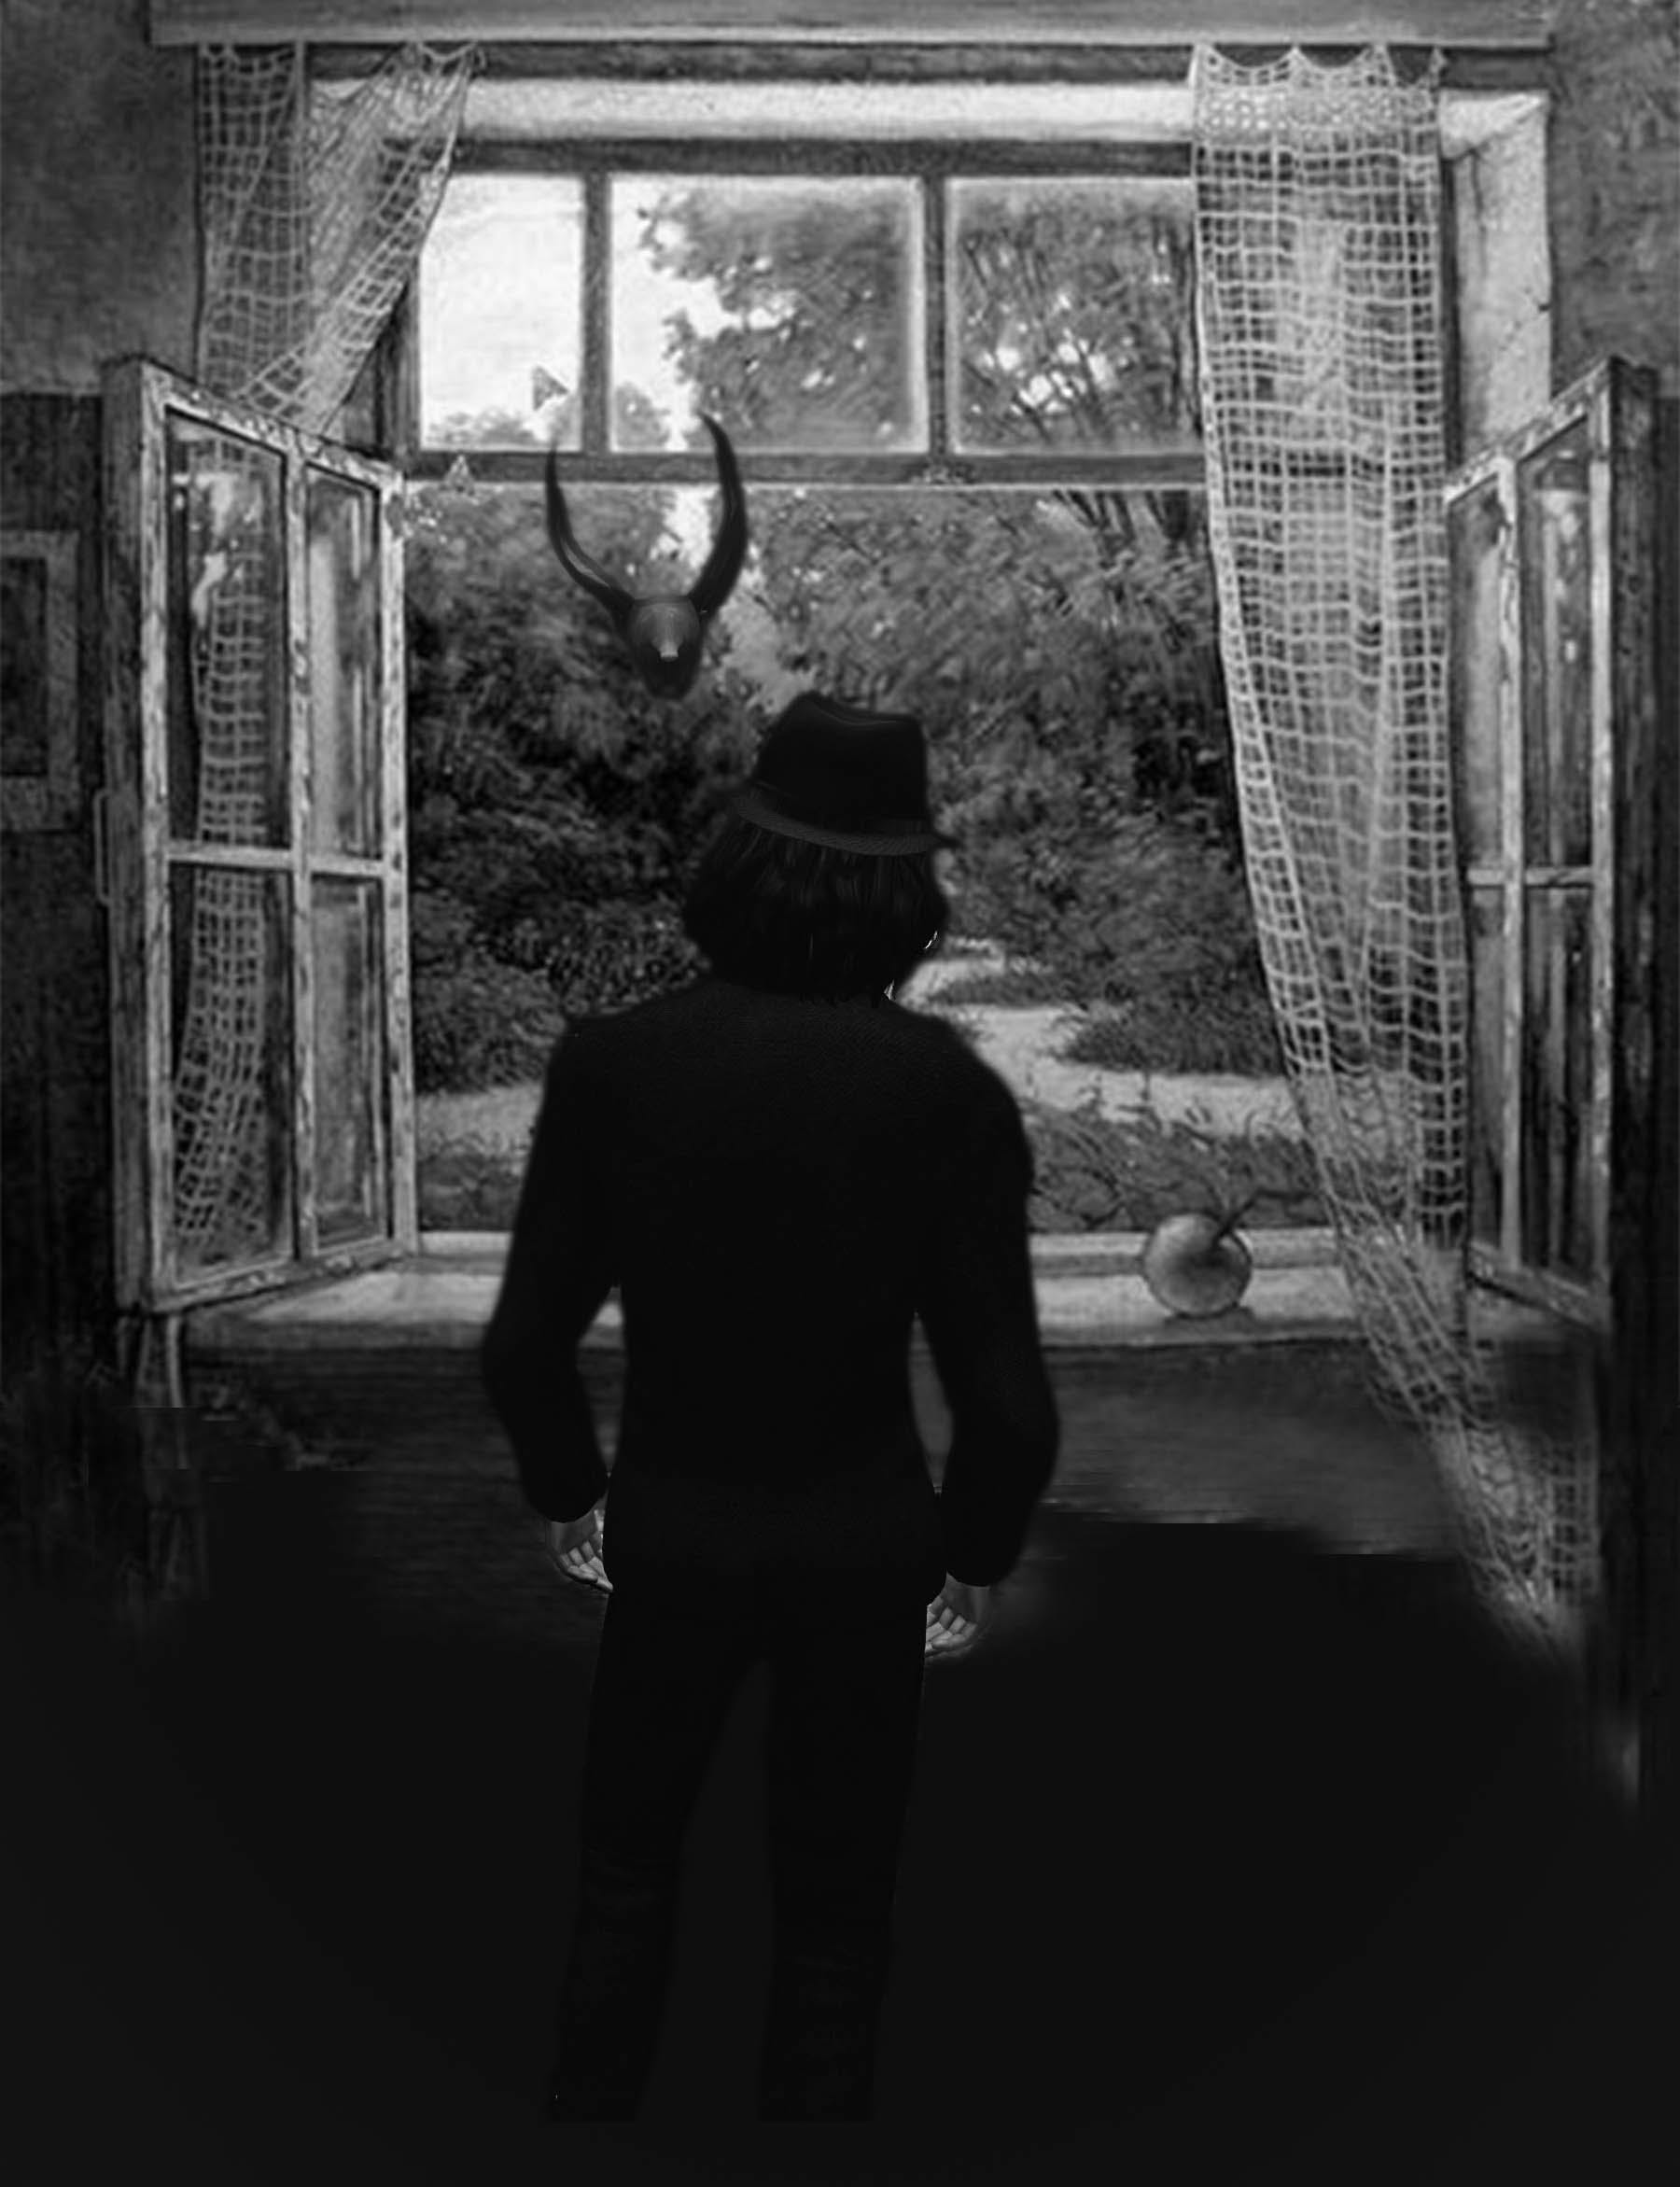 Free stock photo of man, bird, black and white